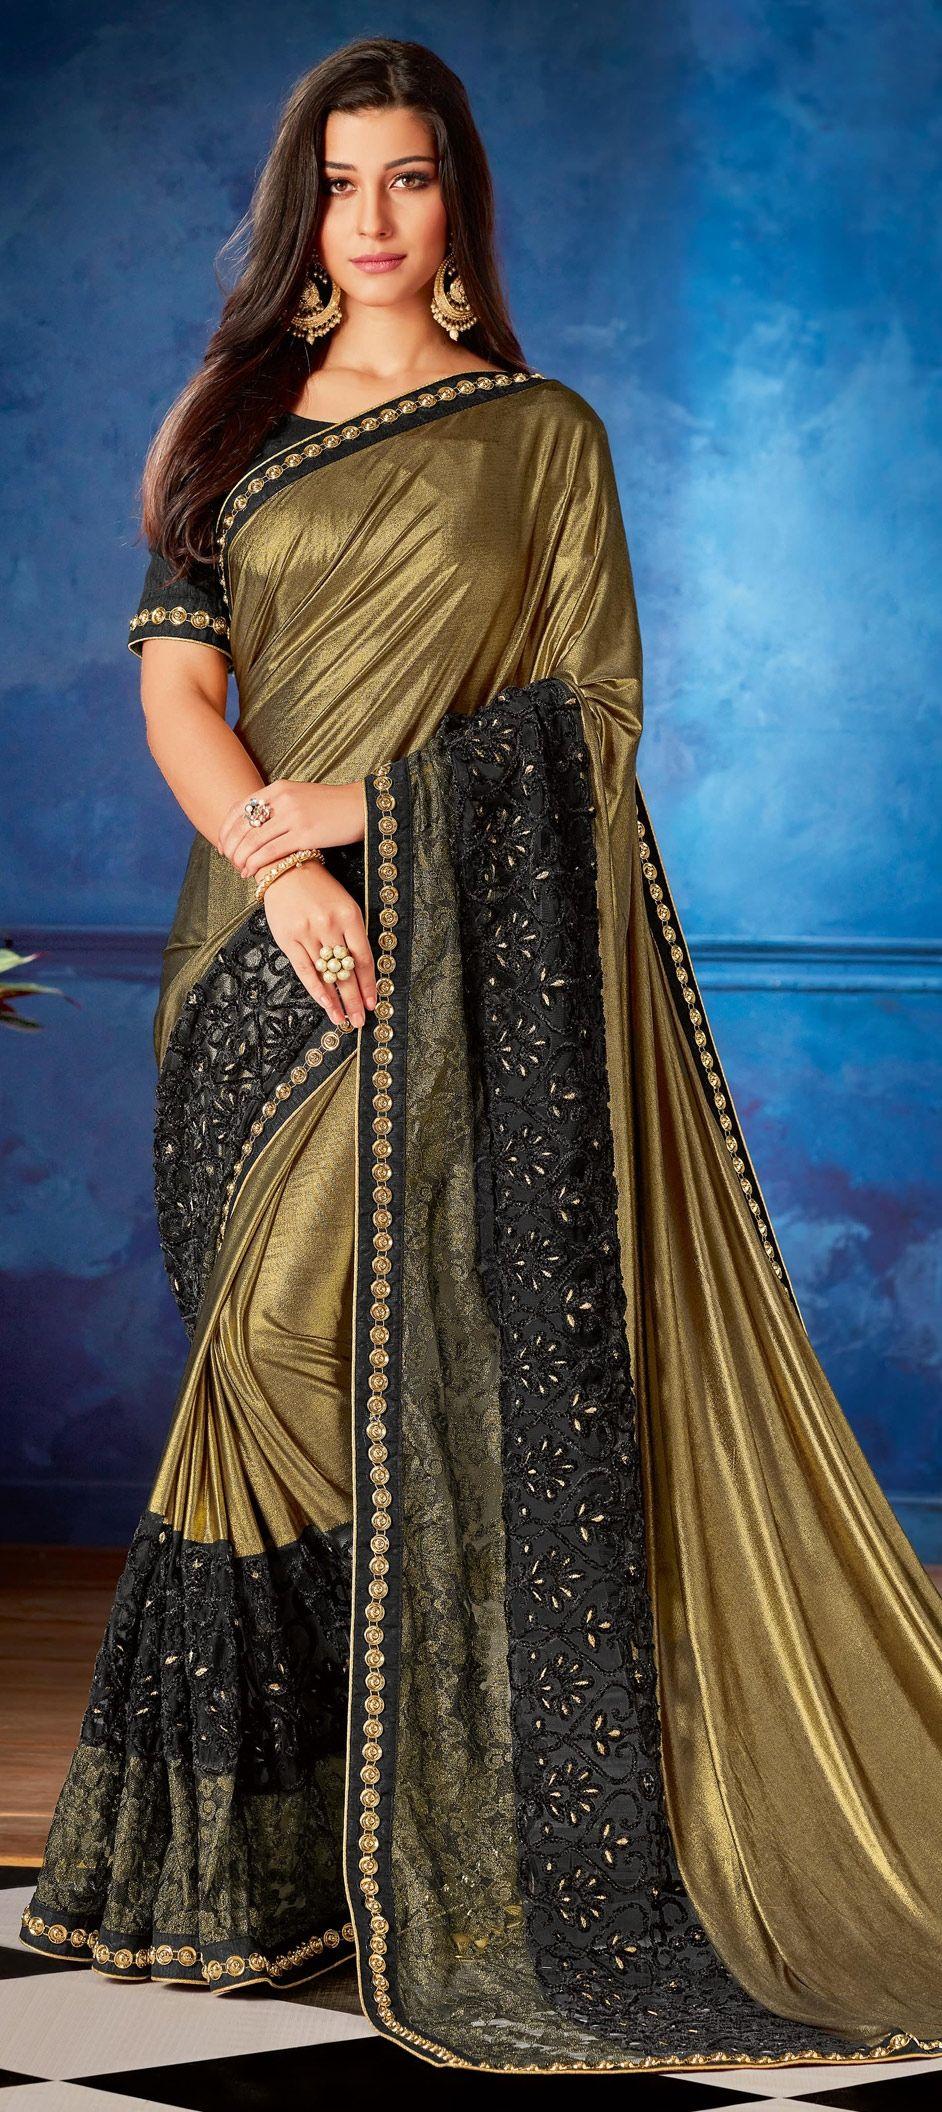 6e6b5b96f1ea46 1522110: Party Wear Black and Grey, Gold color Lycra, Net fabric Saree